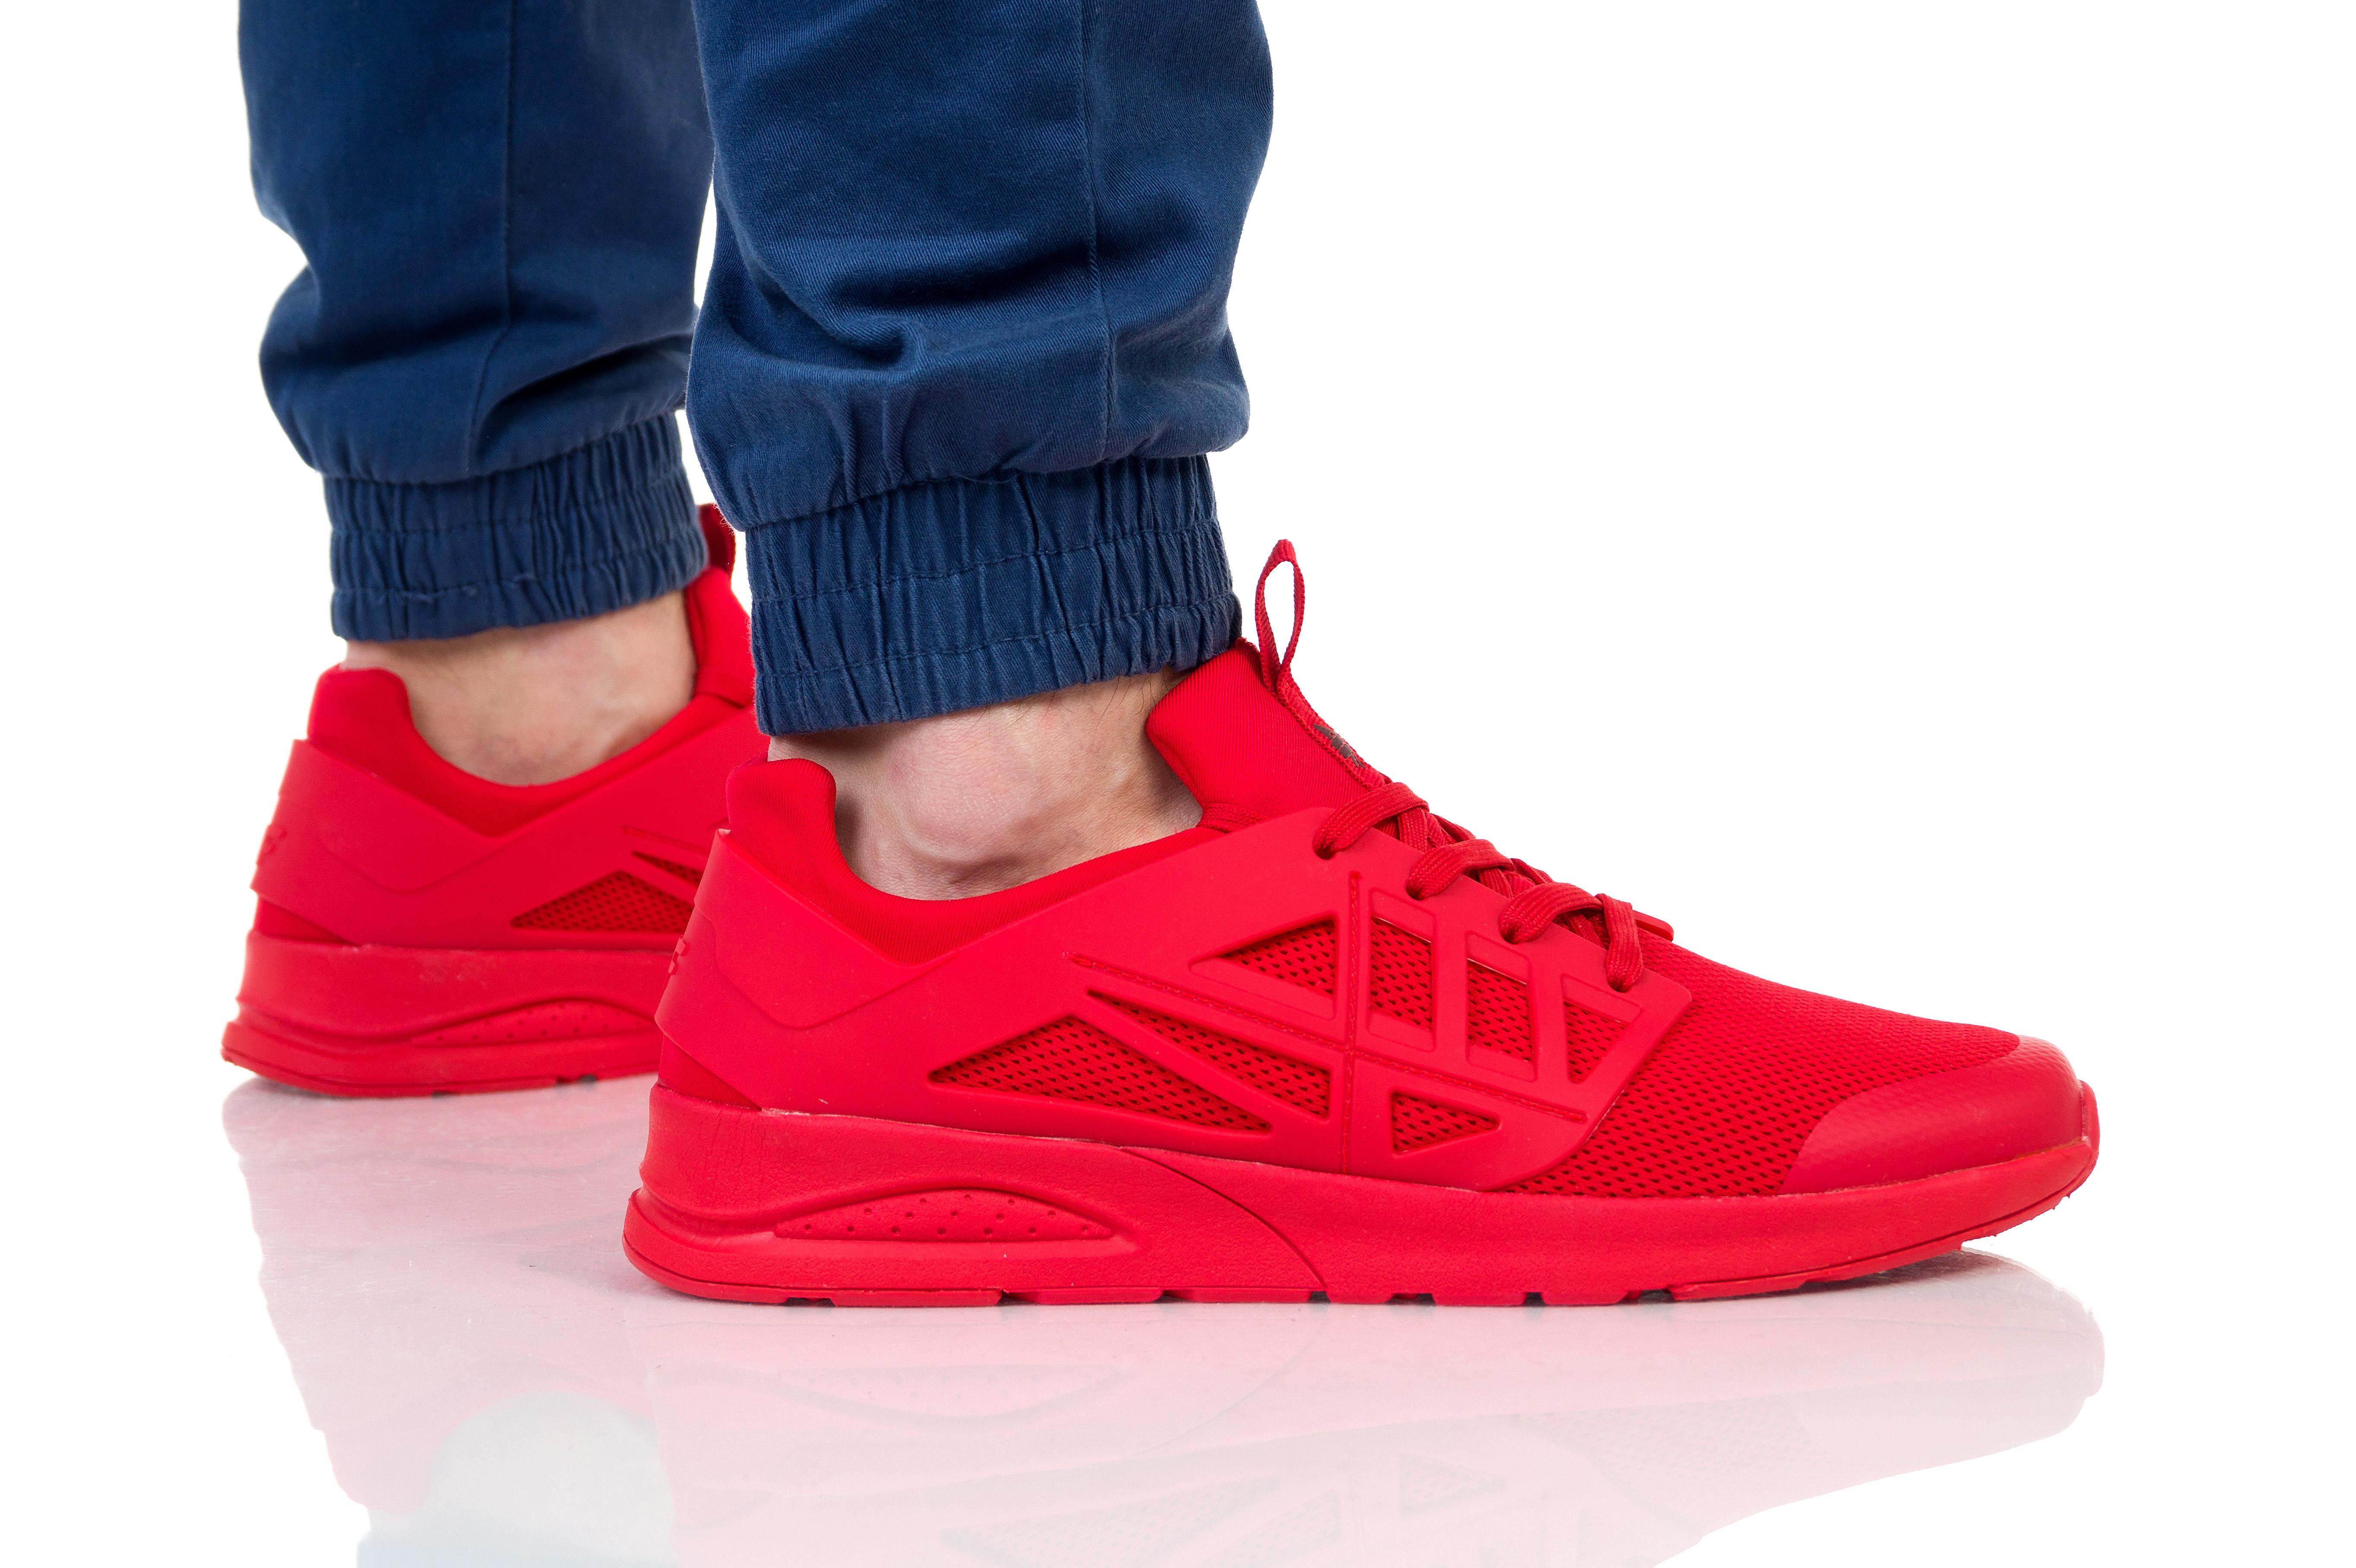 נעליים פור אף לגברים 4F D4L19 OBML202 - אדום